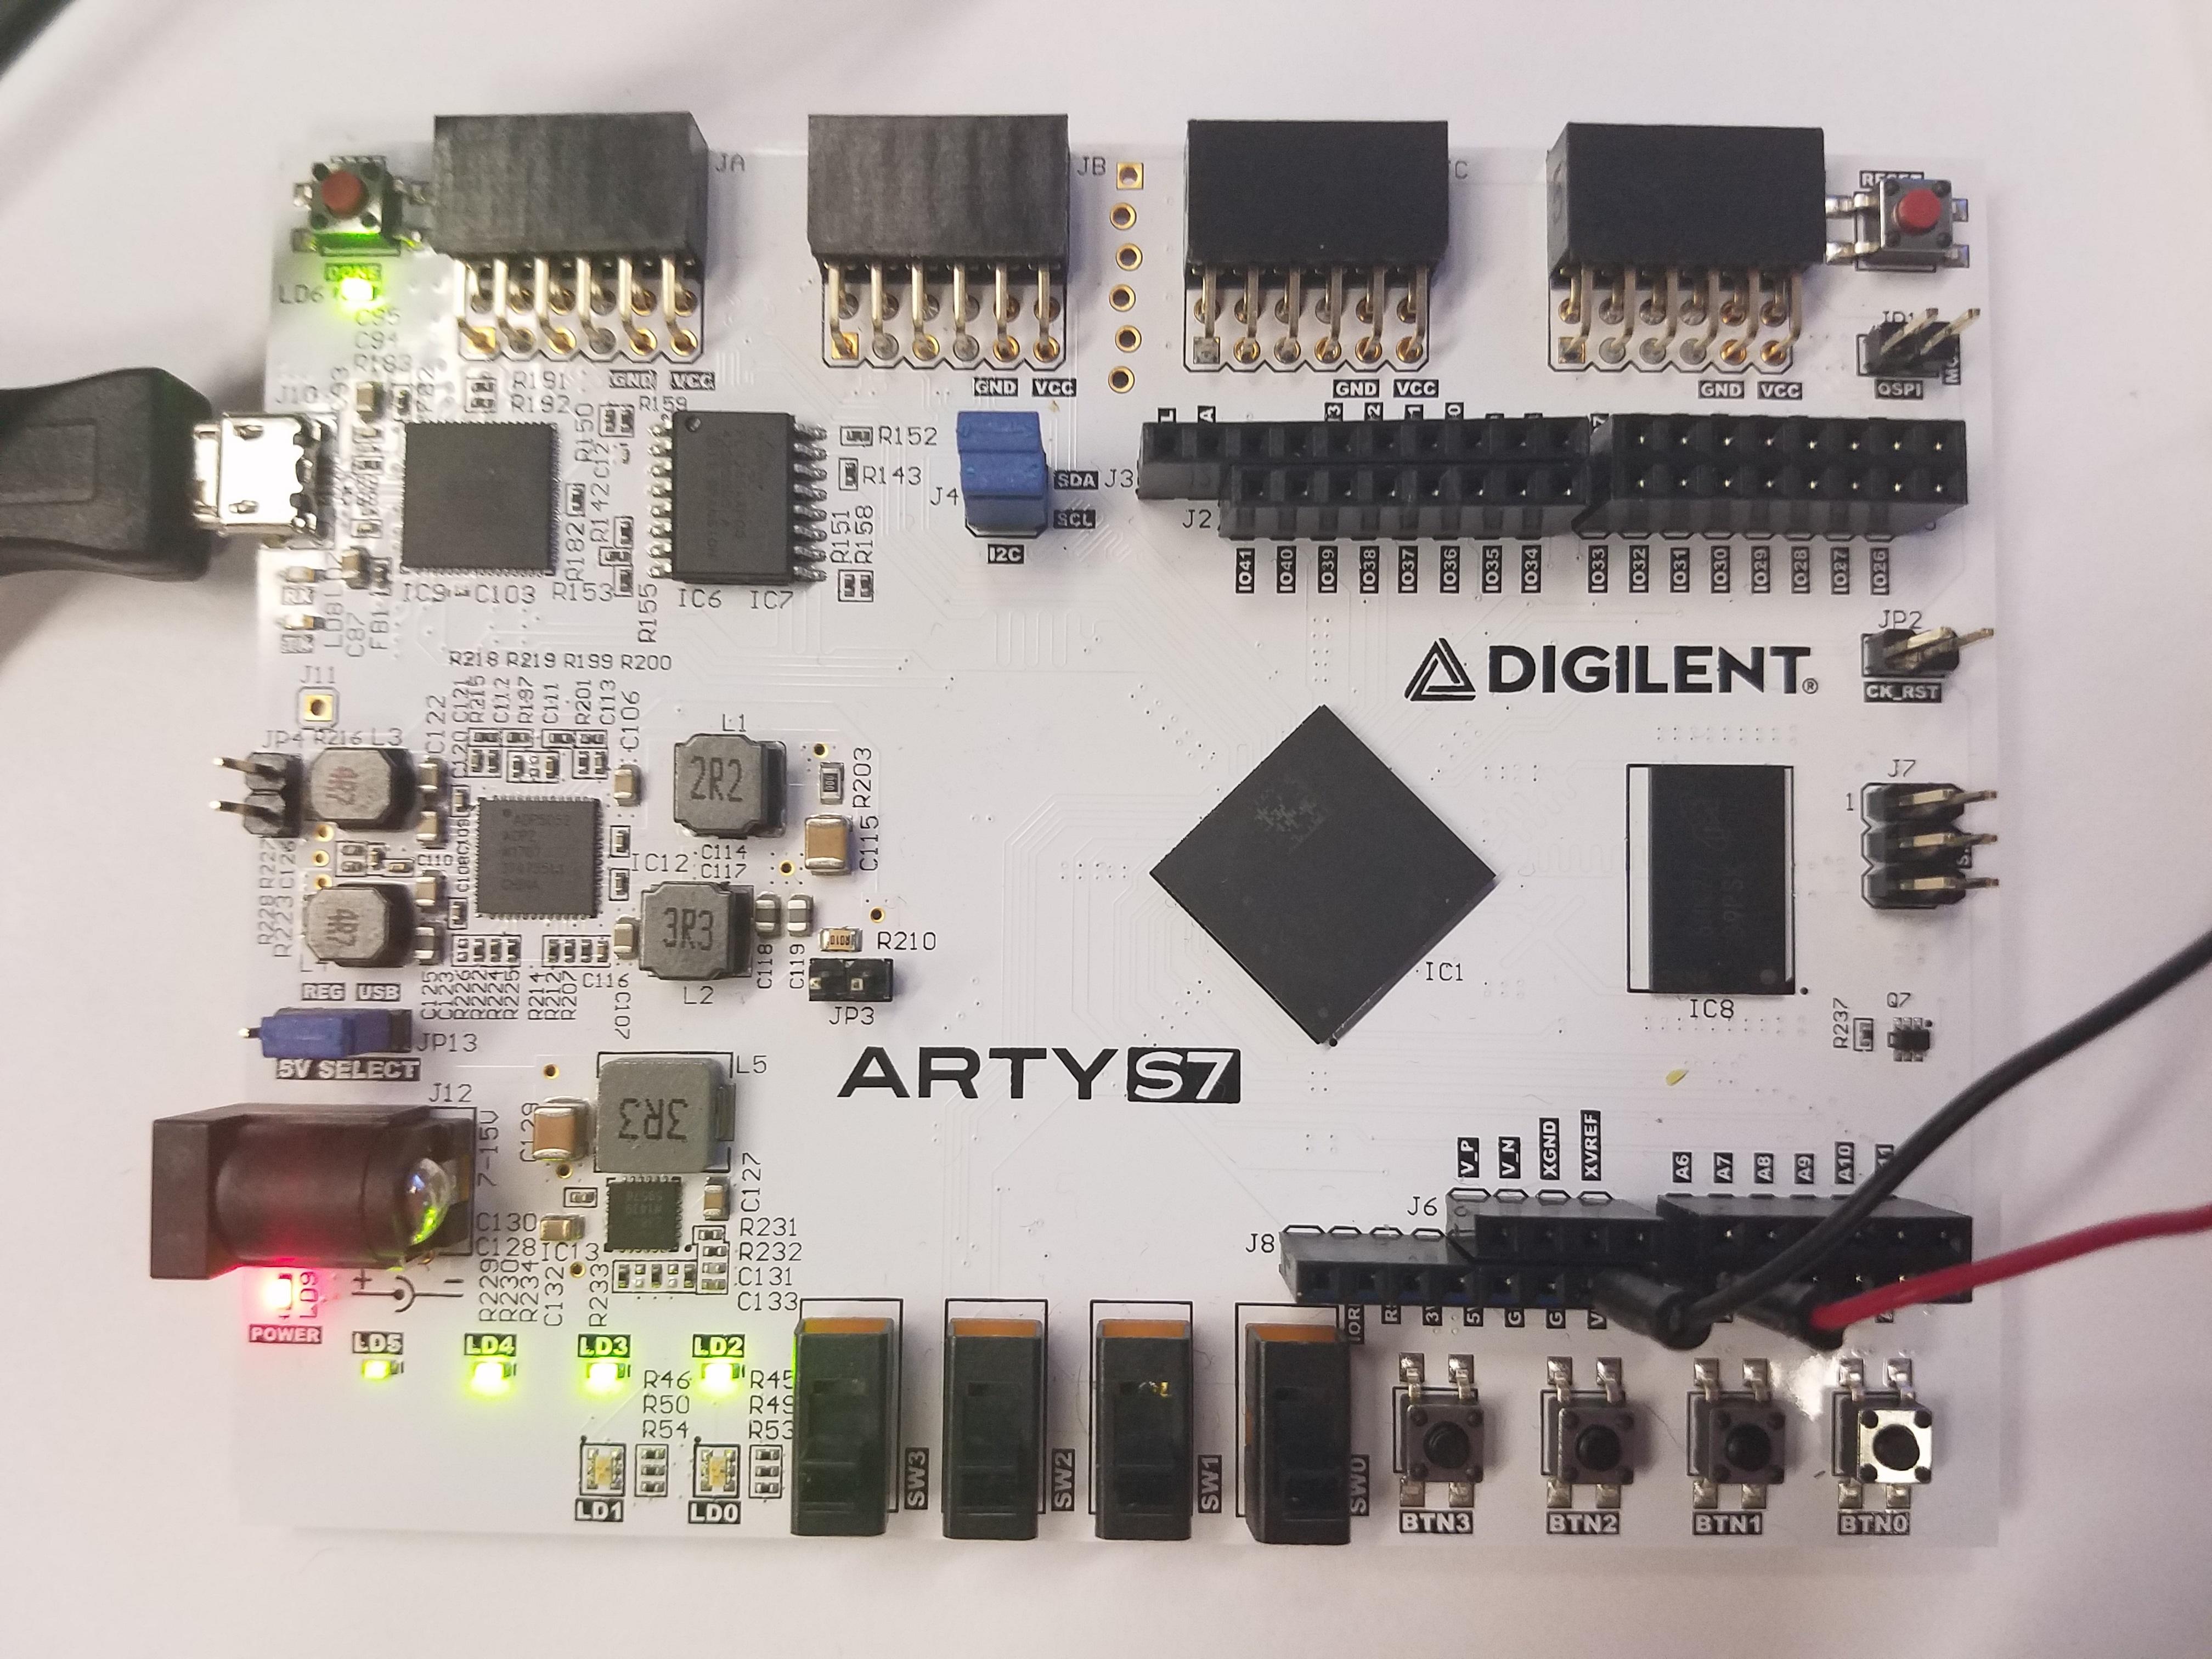 learn:programmable-logic:tutorials:arty-s7-xadc-demo:arty-s7-xadc-2v.jpg